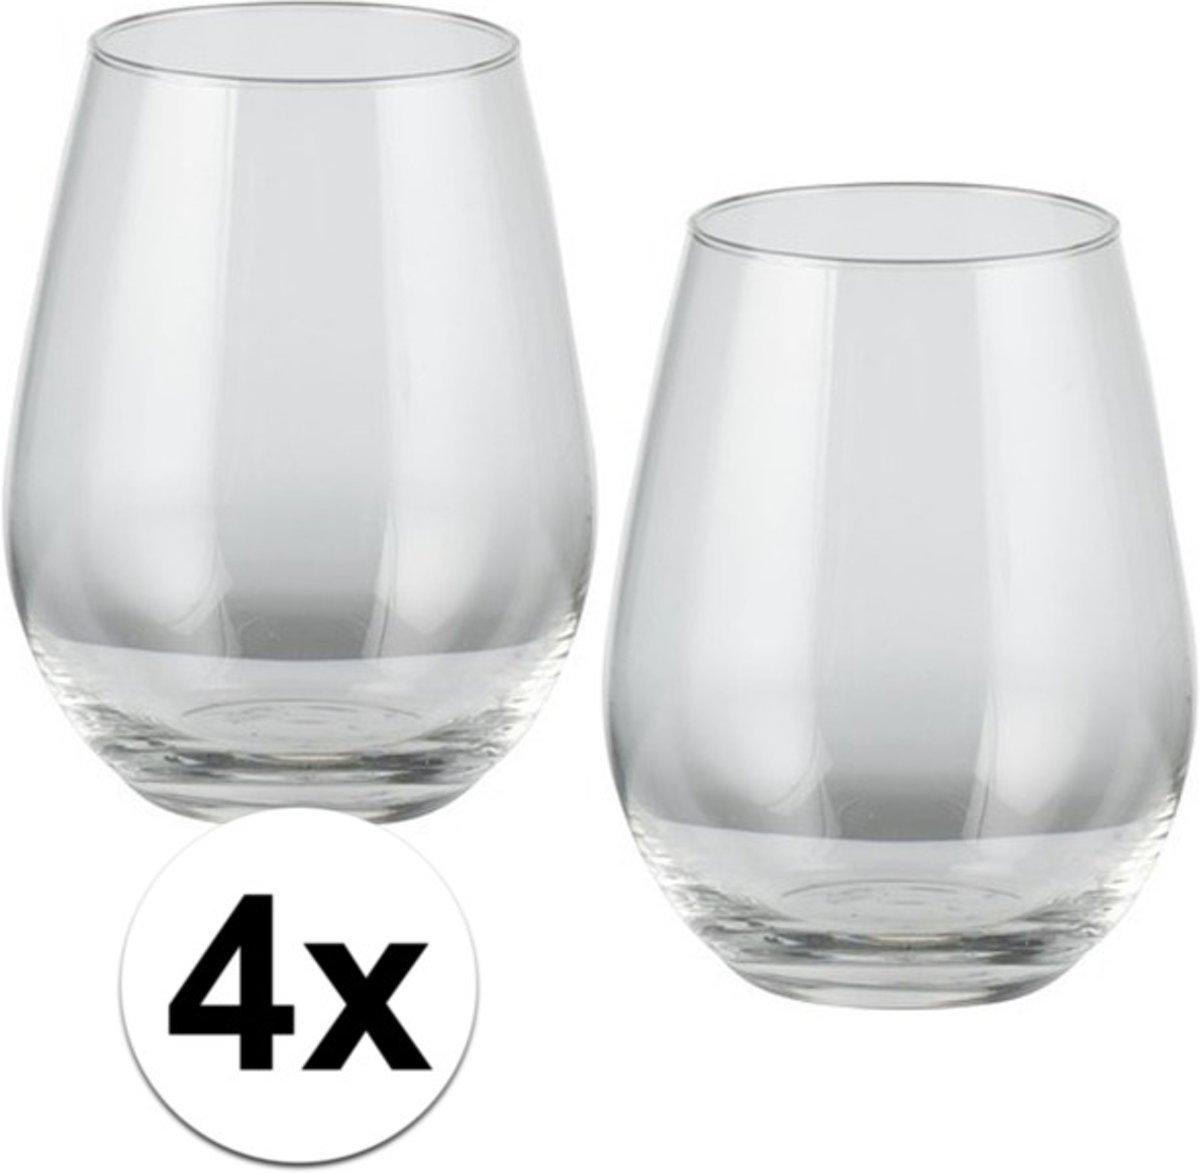 4x voordelige whiskey glazen - 350 ml - whiskeyglas kopen